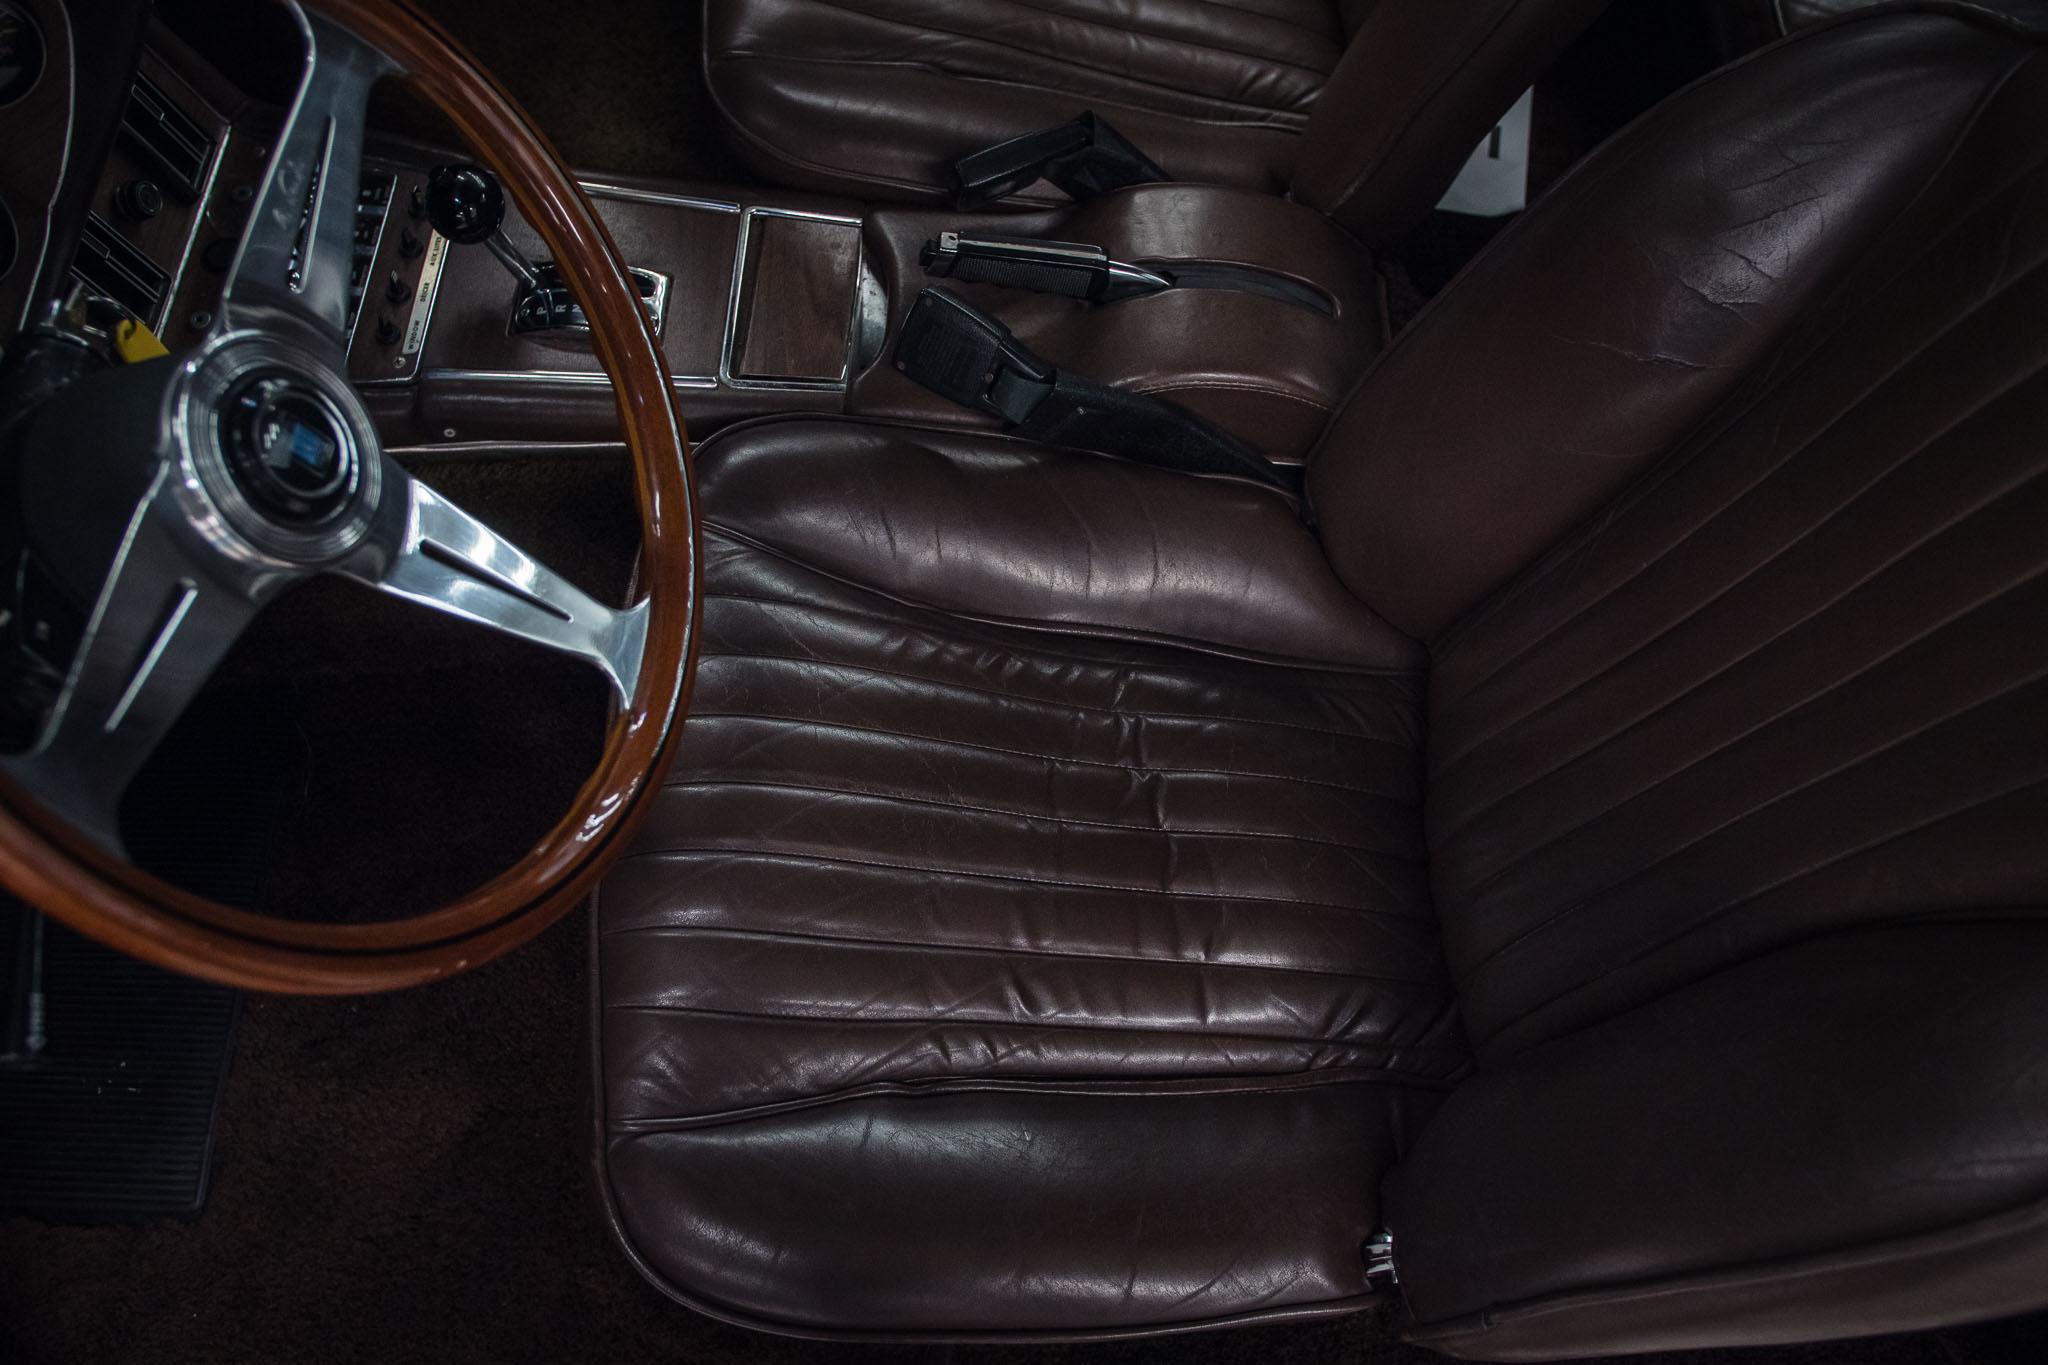 1977 Avanti II